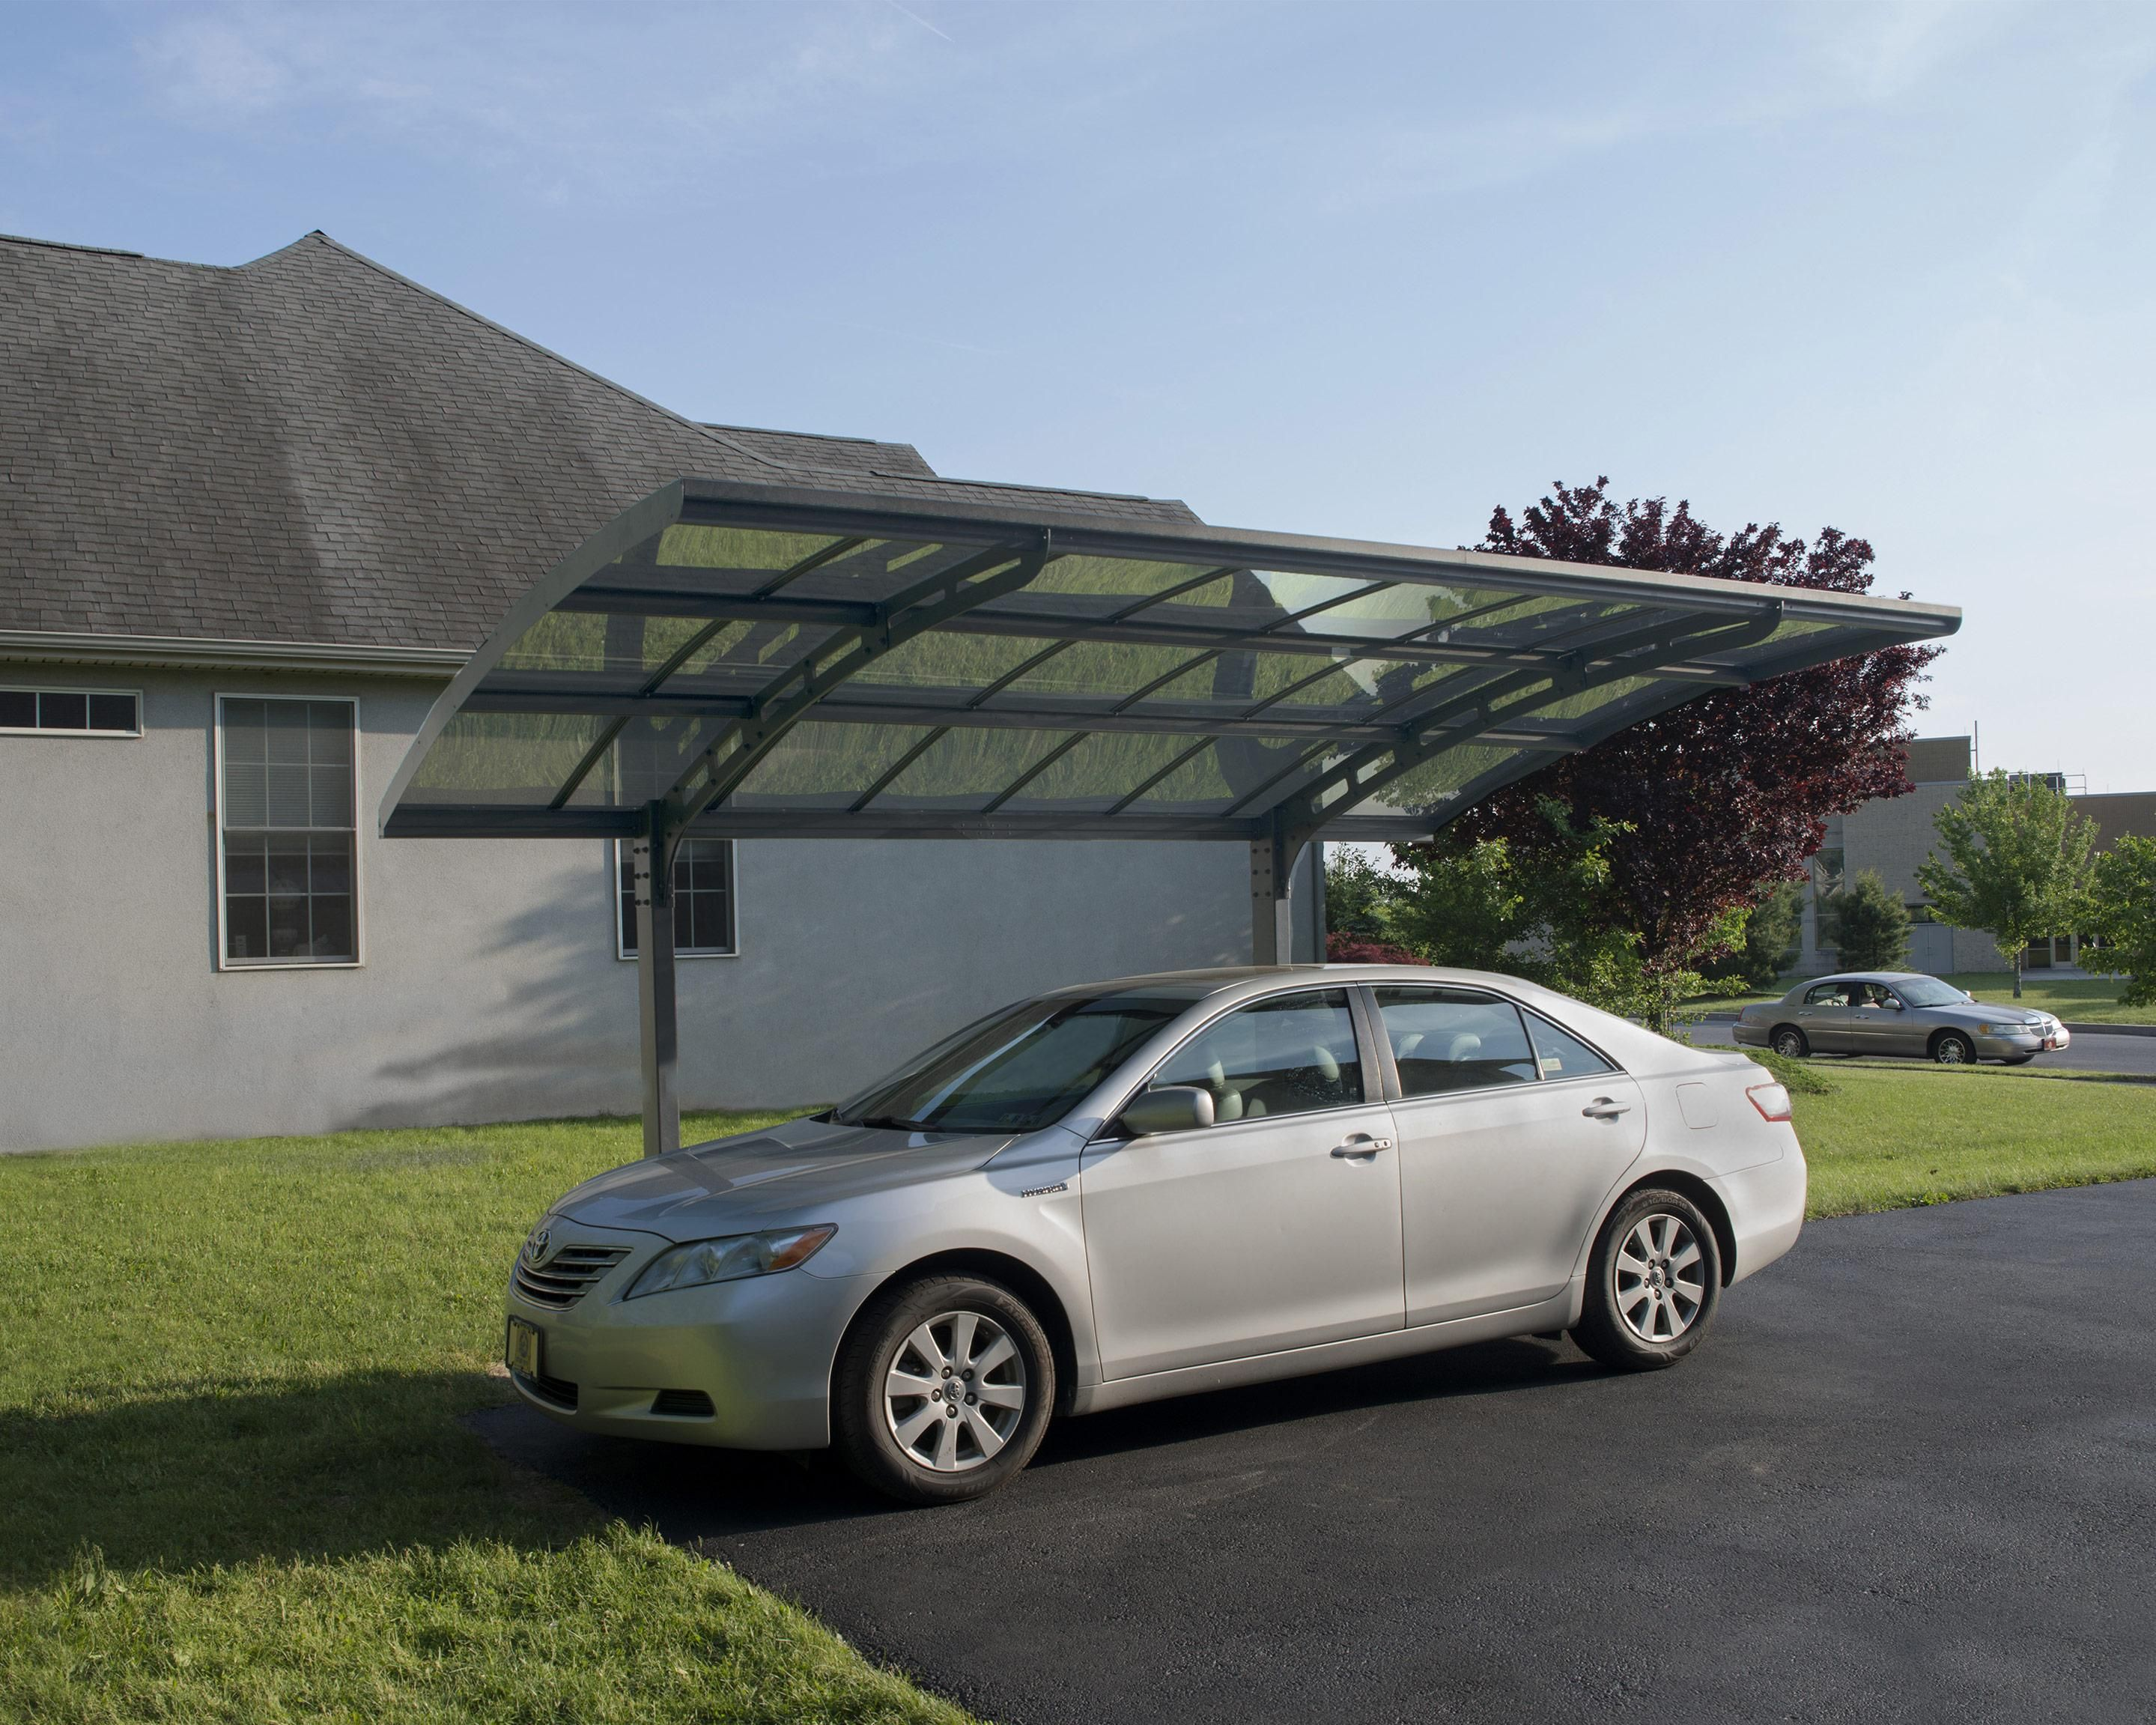 Carport aluminium et acier galvanisé Palram Arizona Breeze